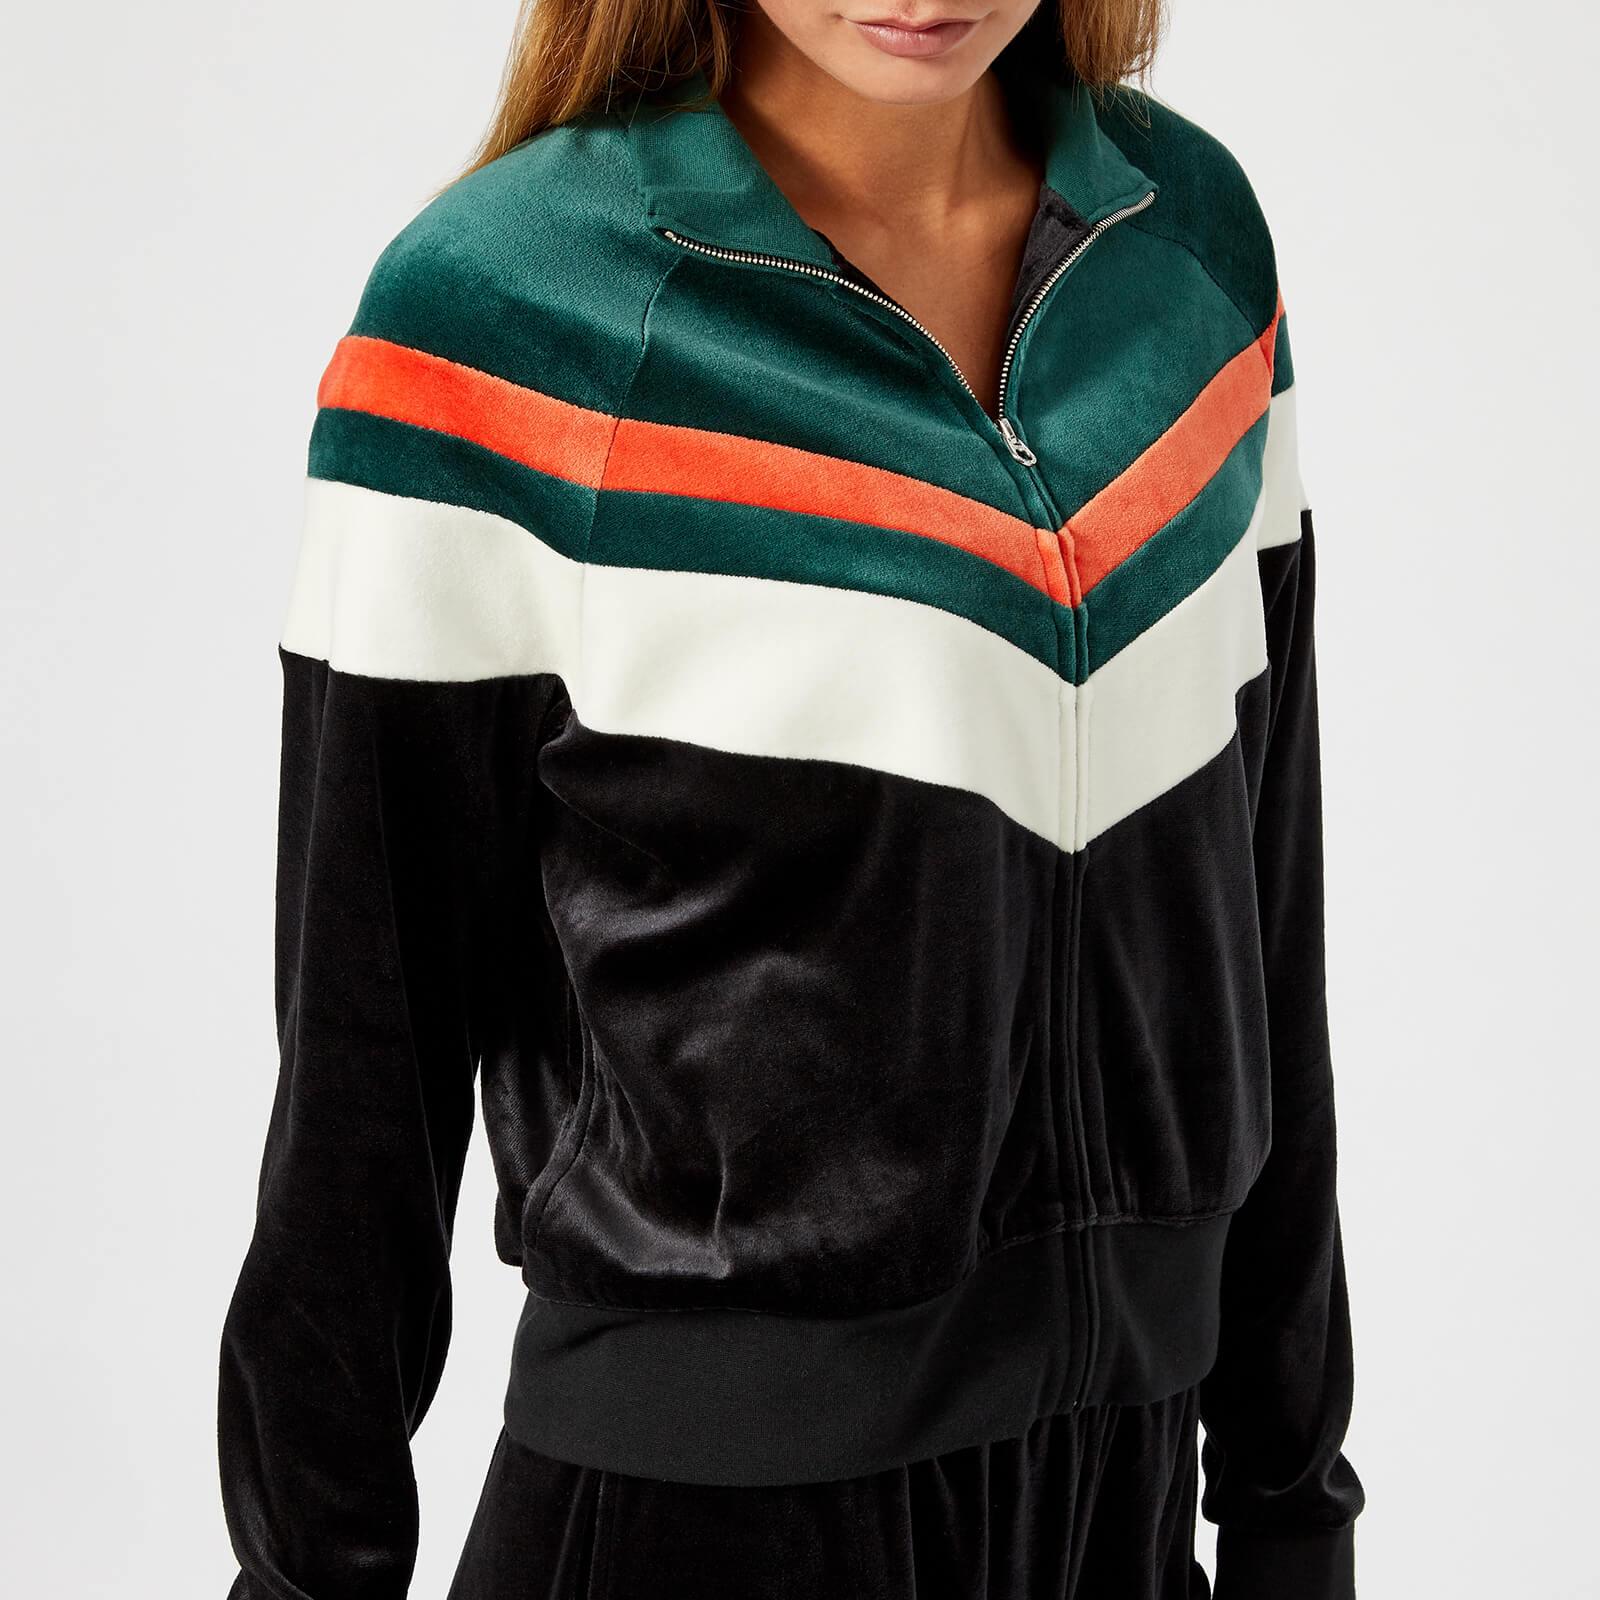 364b9840d Juicy Couture Women's Colourblock Lightweight Velour Palisades Jacket -  Pitch Black Dark Absinthe Combo Womens Clothing   TheHut.com